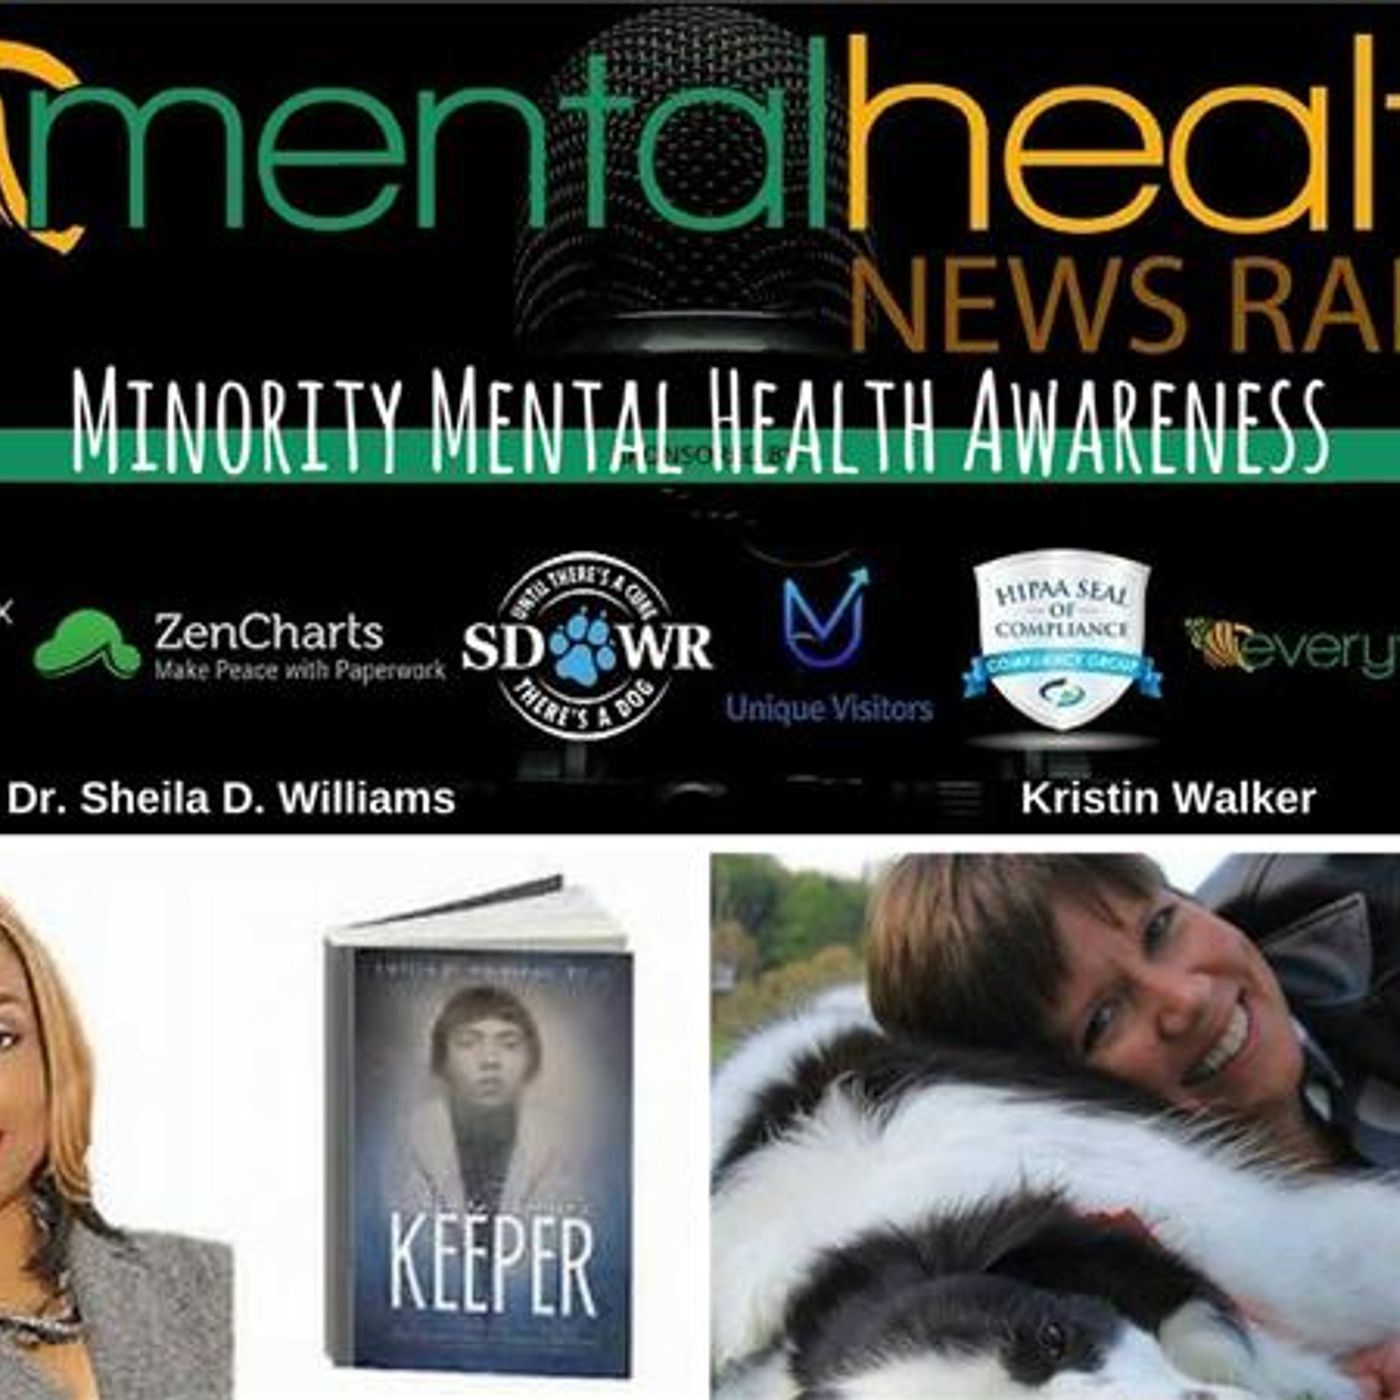 Mental Health News Radio - Minority Mental Health Awareness with Dr. Sheila D. Williams